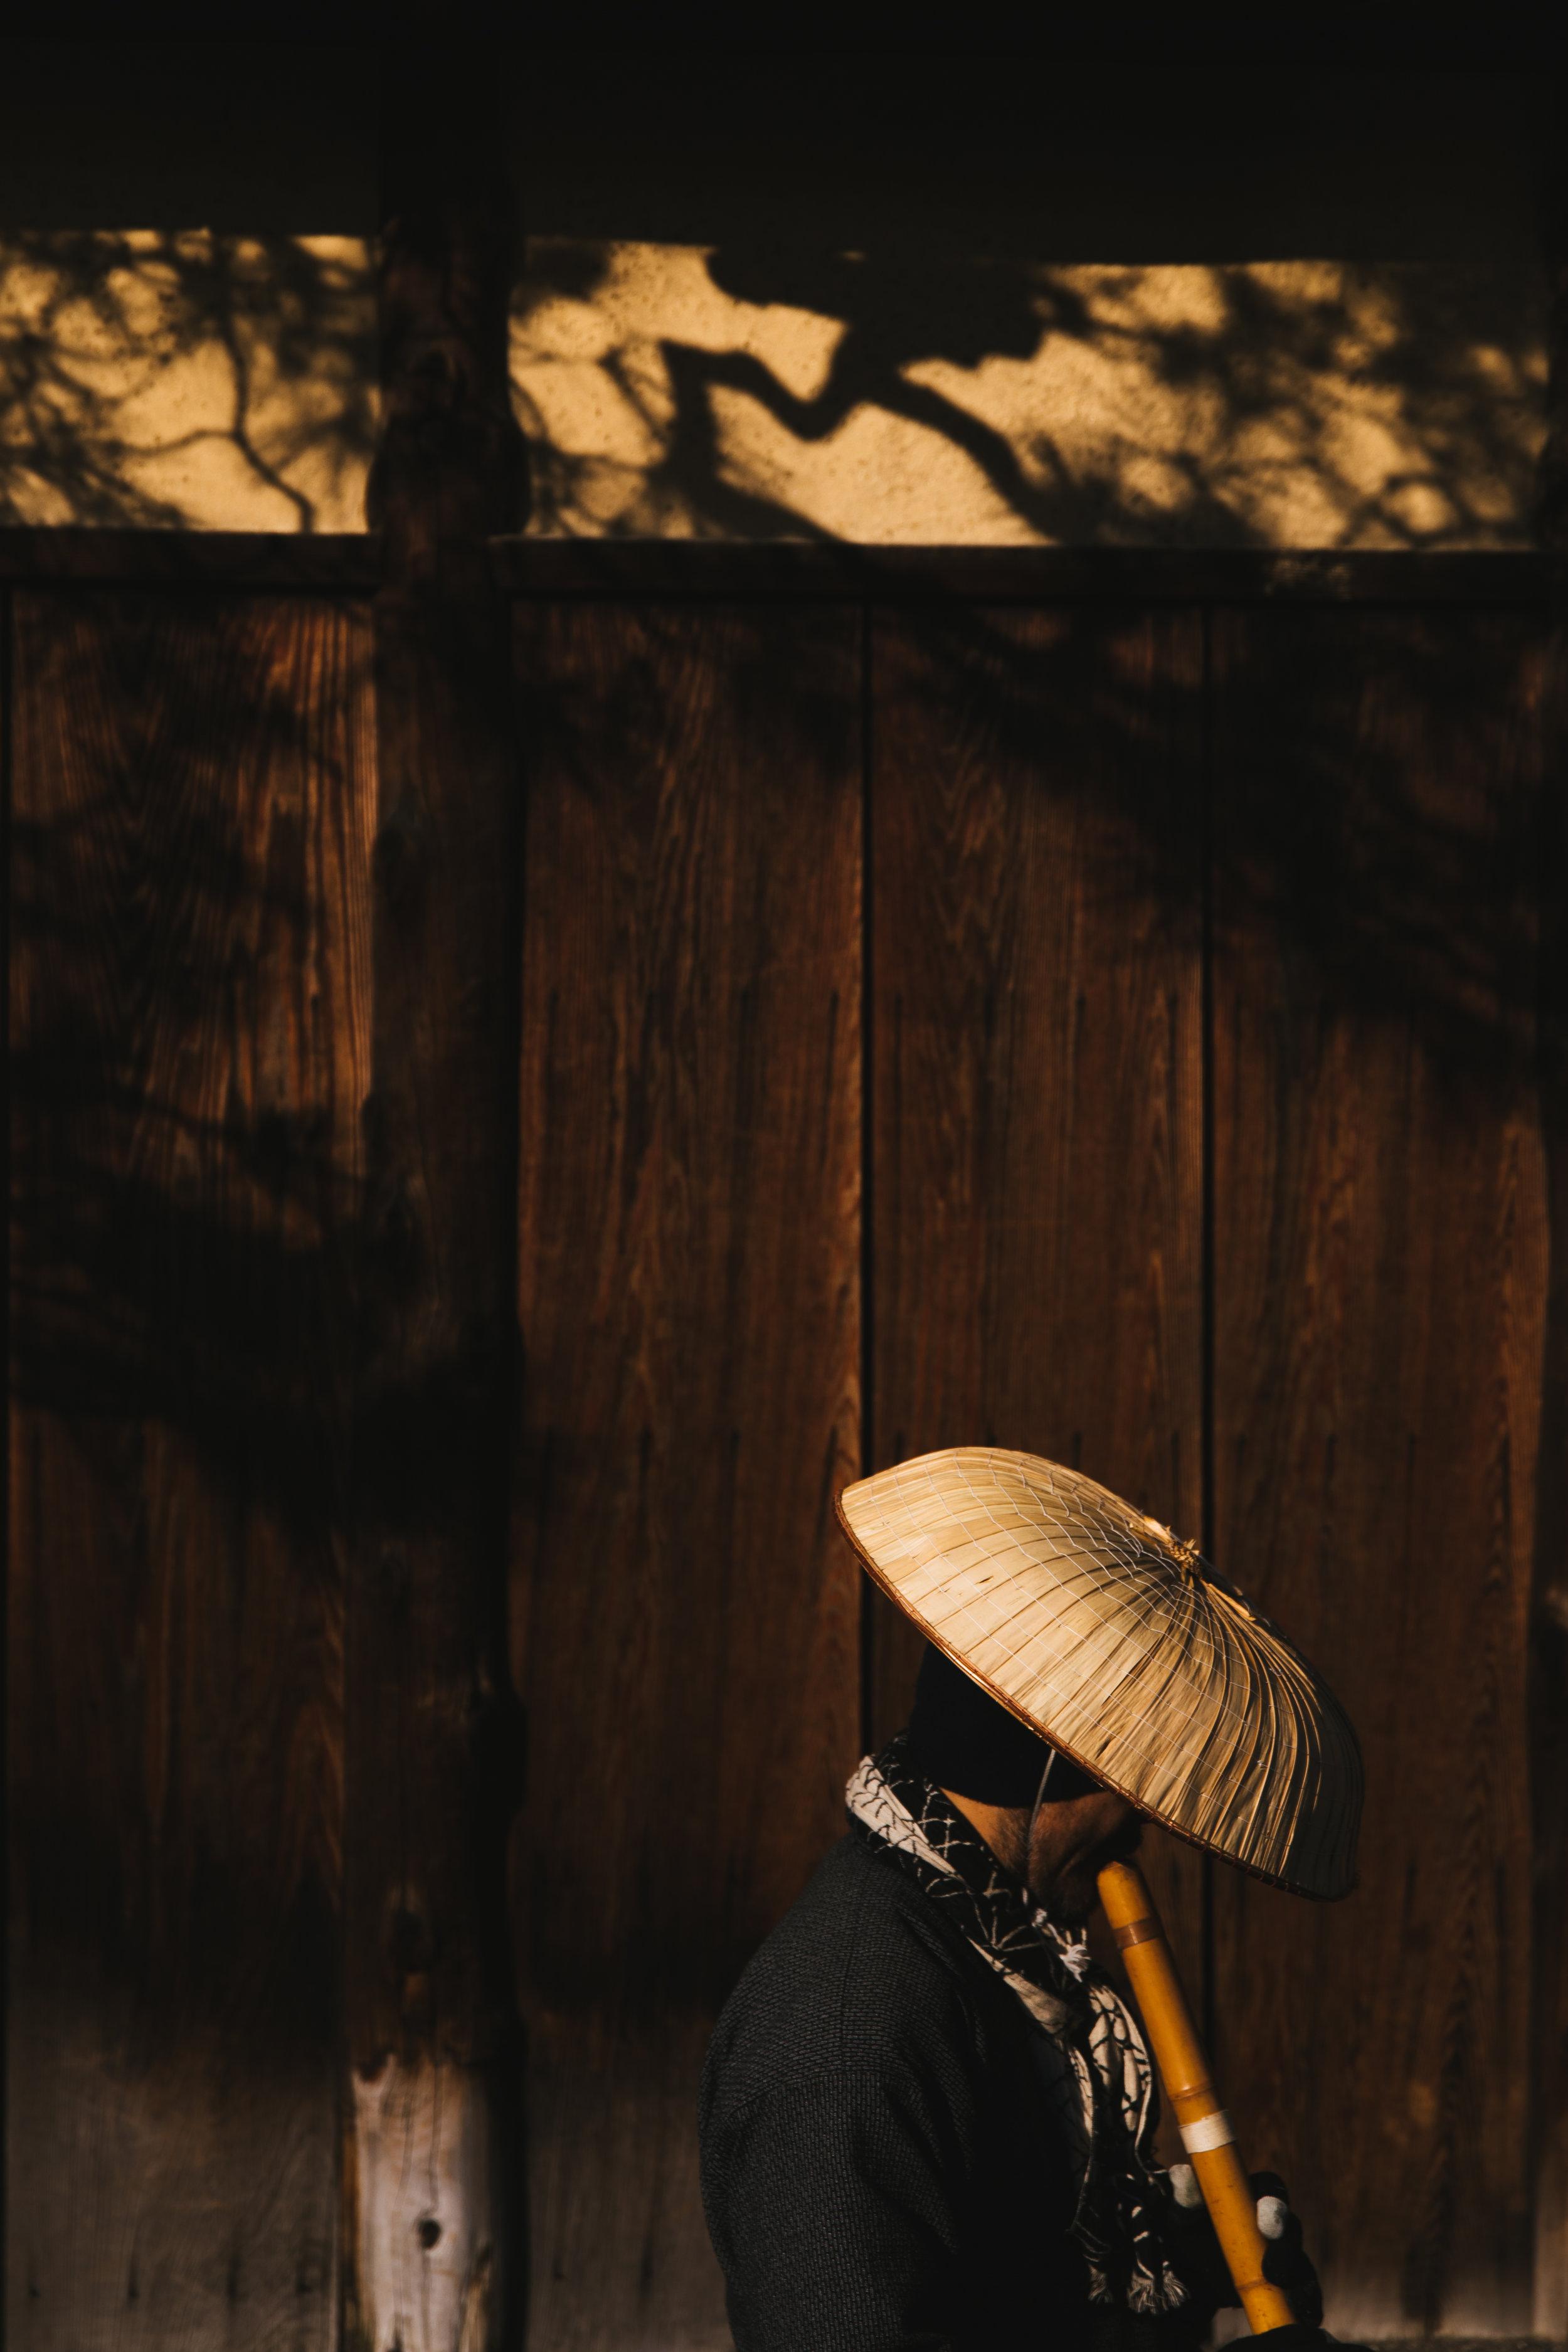 kyoto-japan-instrument.jpg